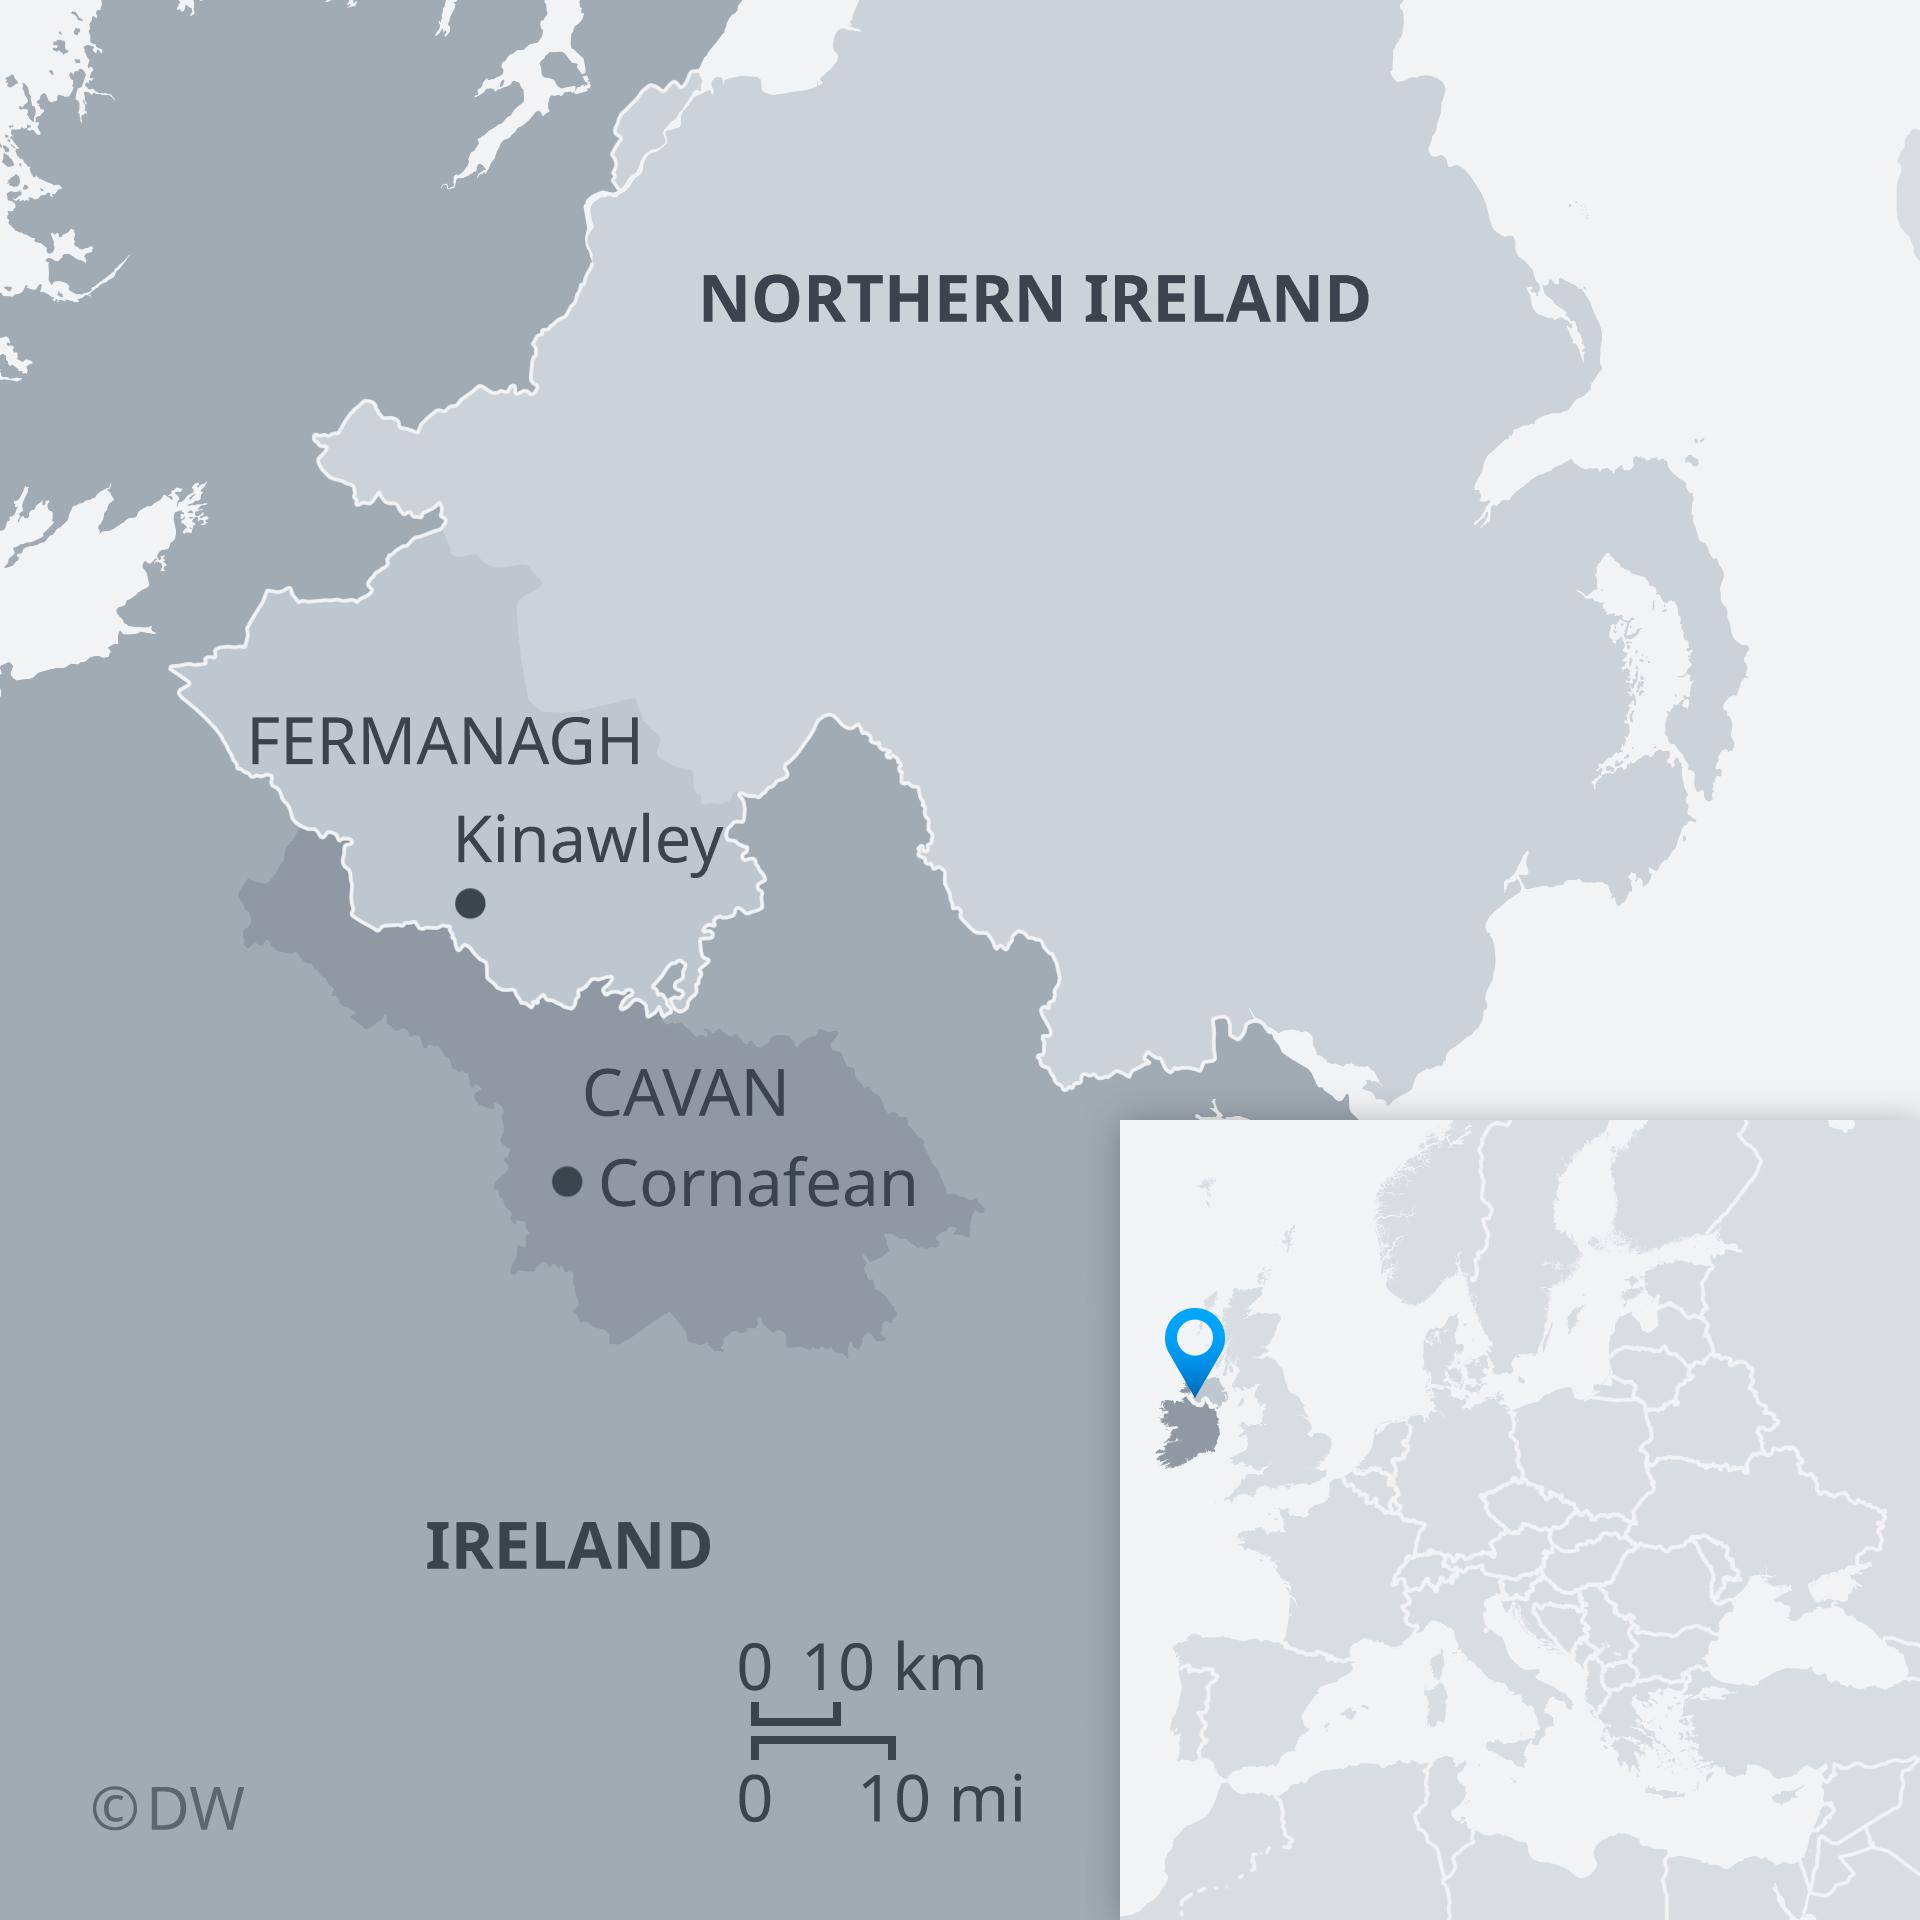 Map of Northern Ireland / Ireland